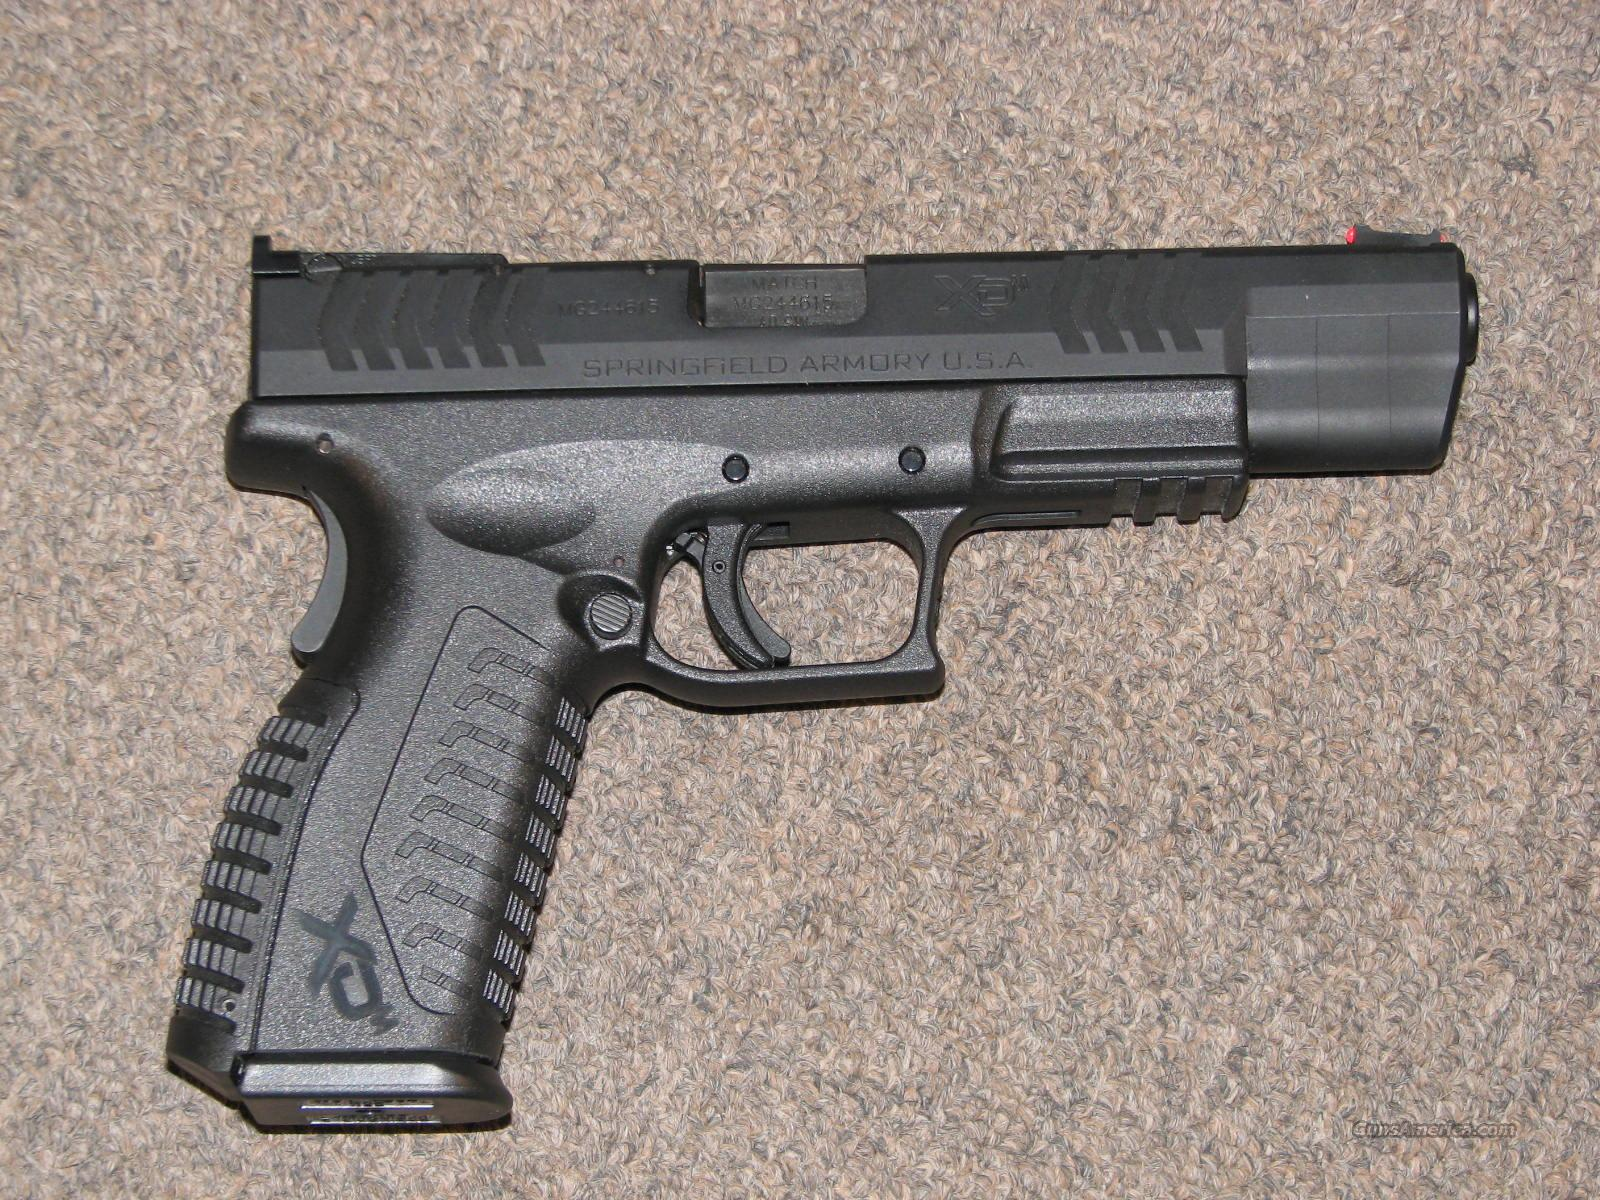 SPRINGFIELD XDM 40 5.25 .40 S&W w/ Gear!  Guns > Pistols > Springfield Armory Pistols > XD-M